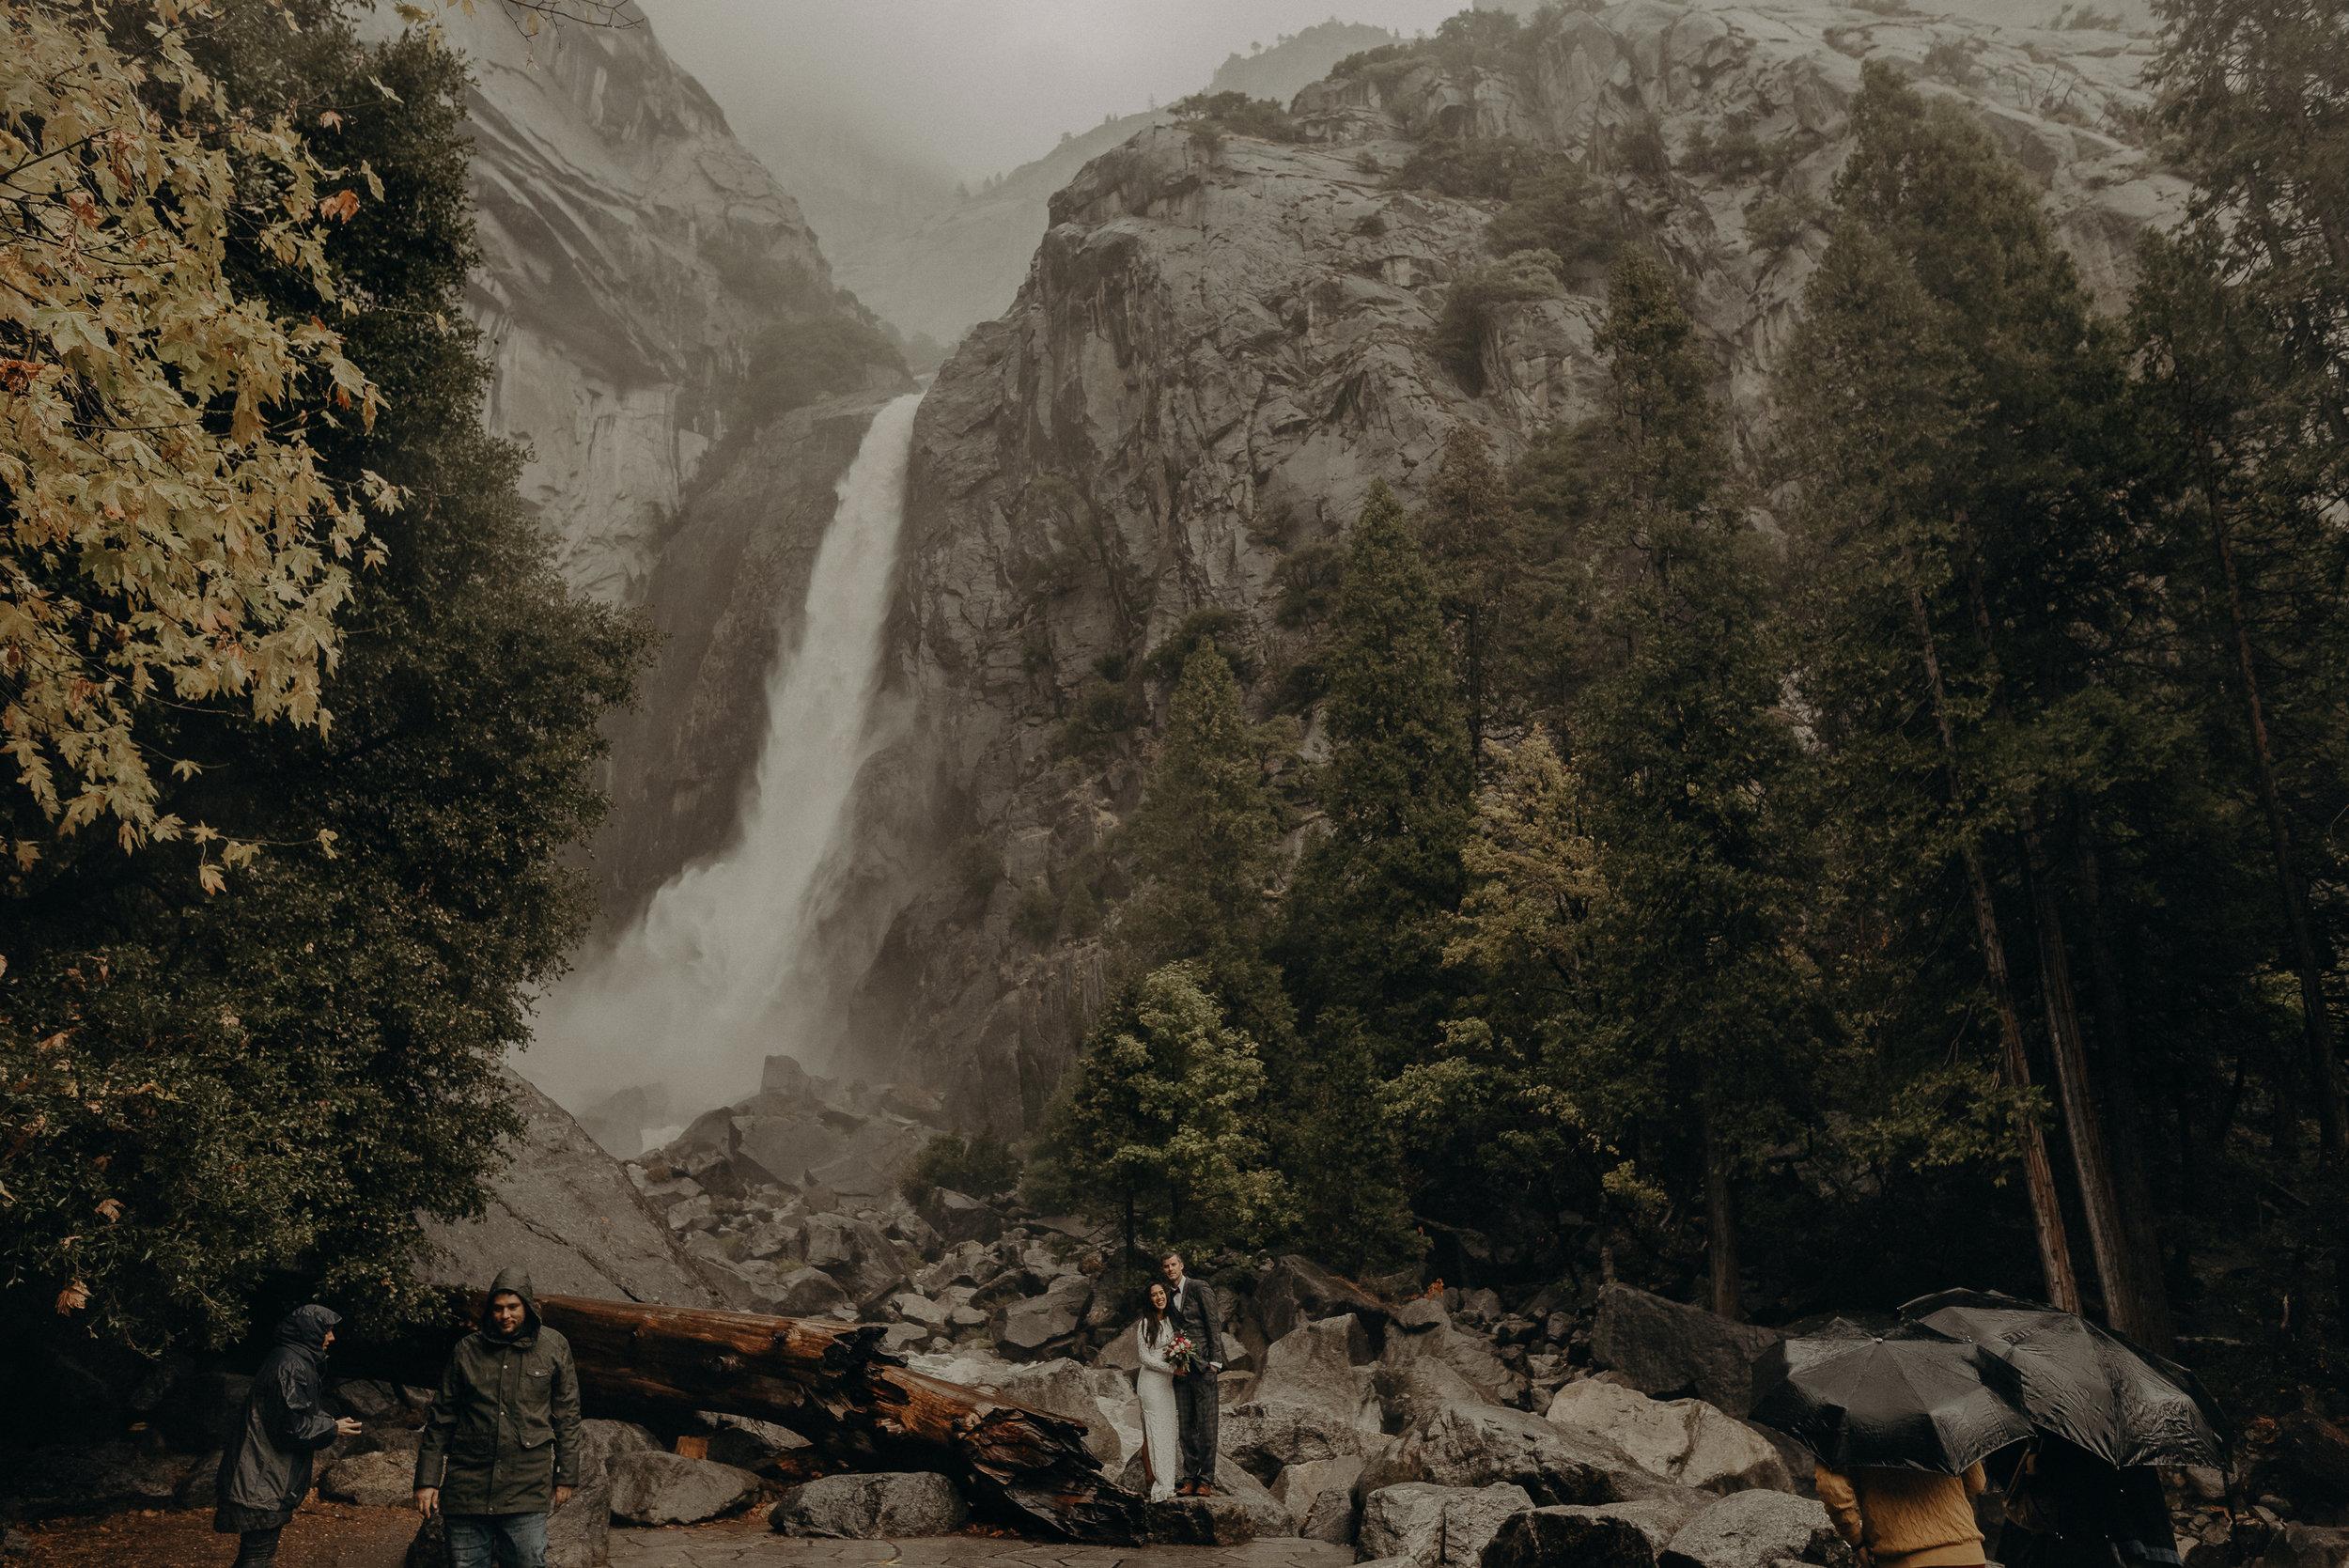 Isaiah + Taylor Photography - Yosemite Elopement - Los Angeles Wedding Photographer-41.jpg